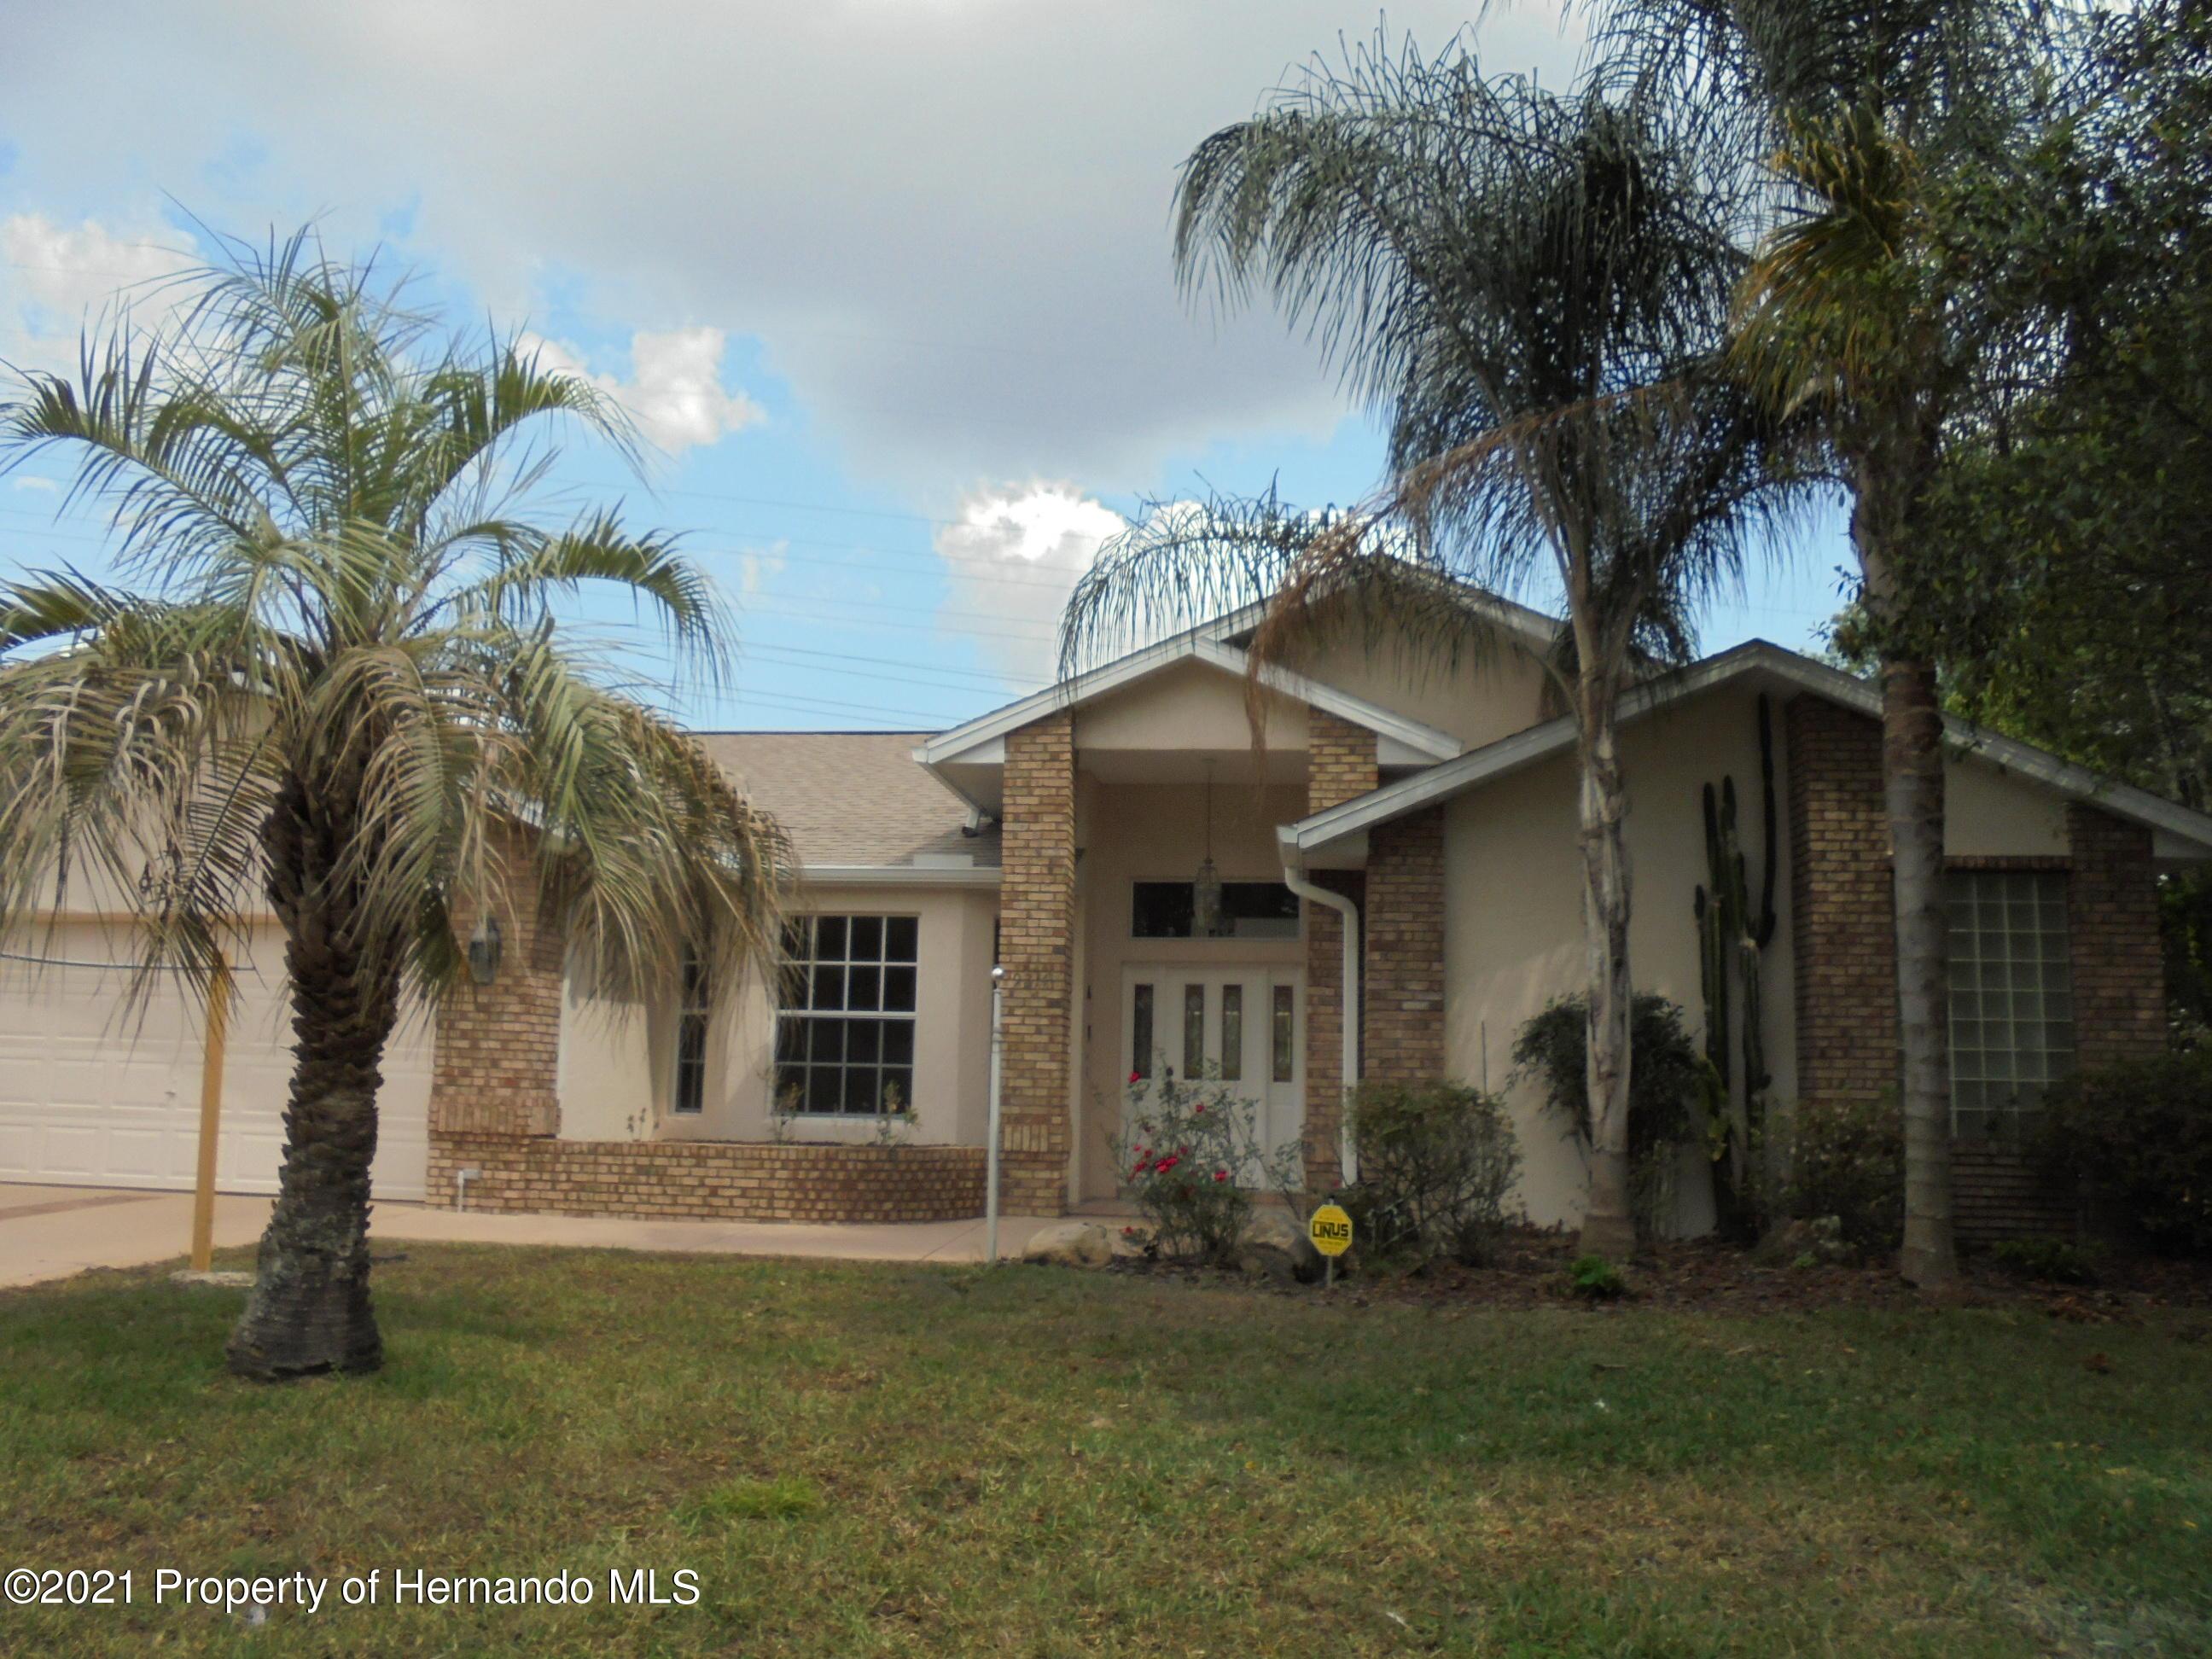 Details for 9314 Eldridge Road, Spring Hill, FL 34608